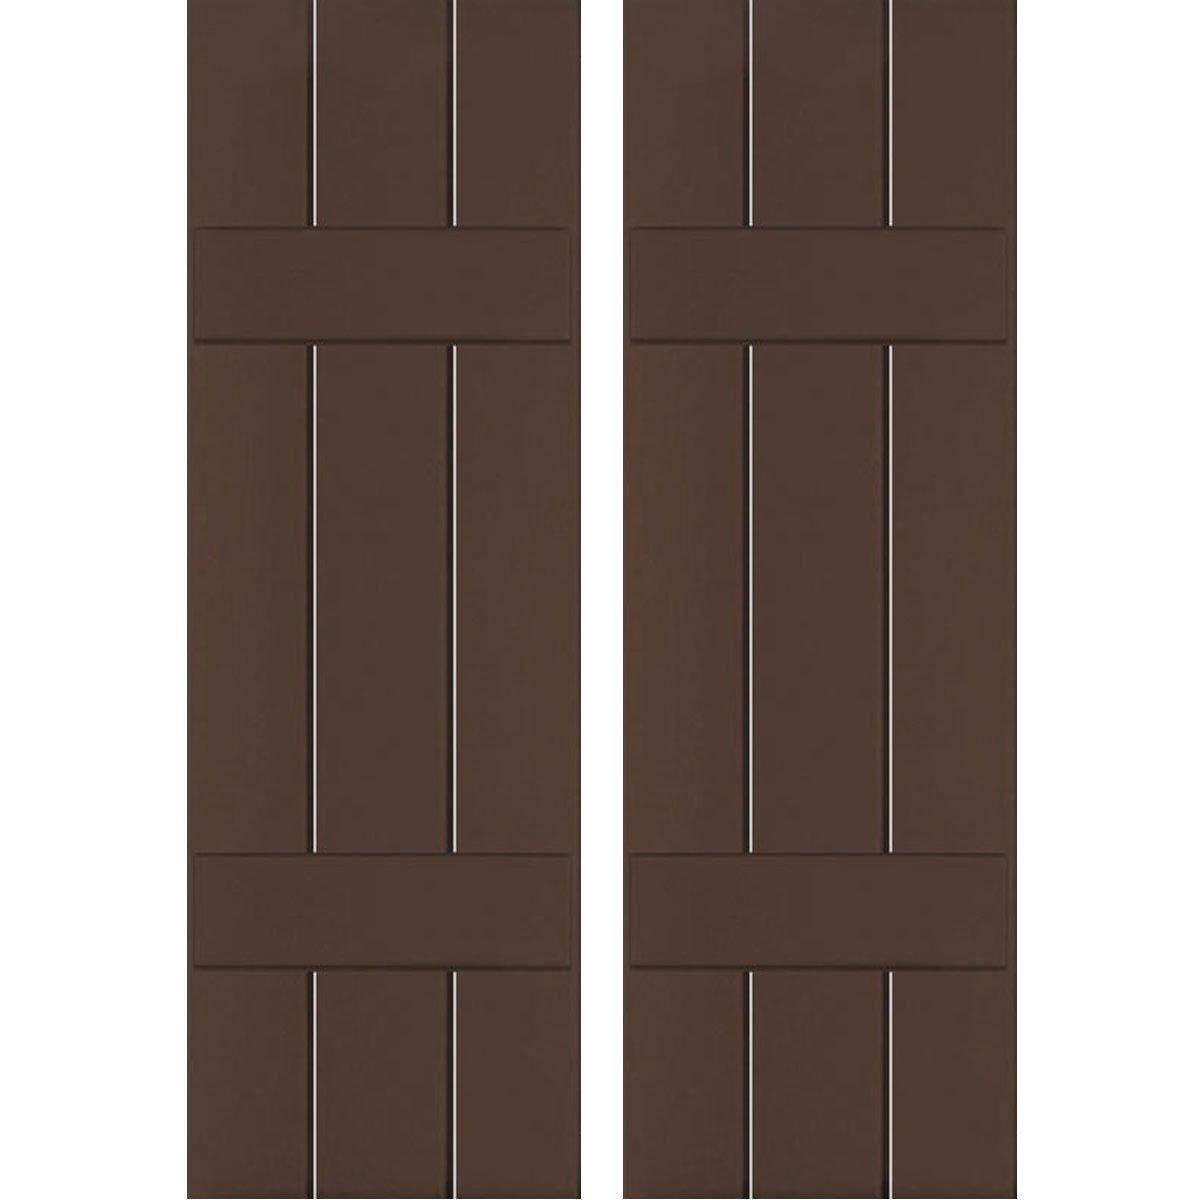 Ekena Millwork CWB12X071TBC Exterior Three Board Composite Wood Board-N-Batten Shutters with Installation Brackets (Per Pair), Tudor Brown, 12''W x 71''H by Ekena Millwork